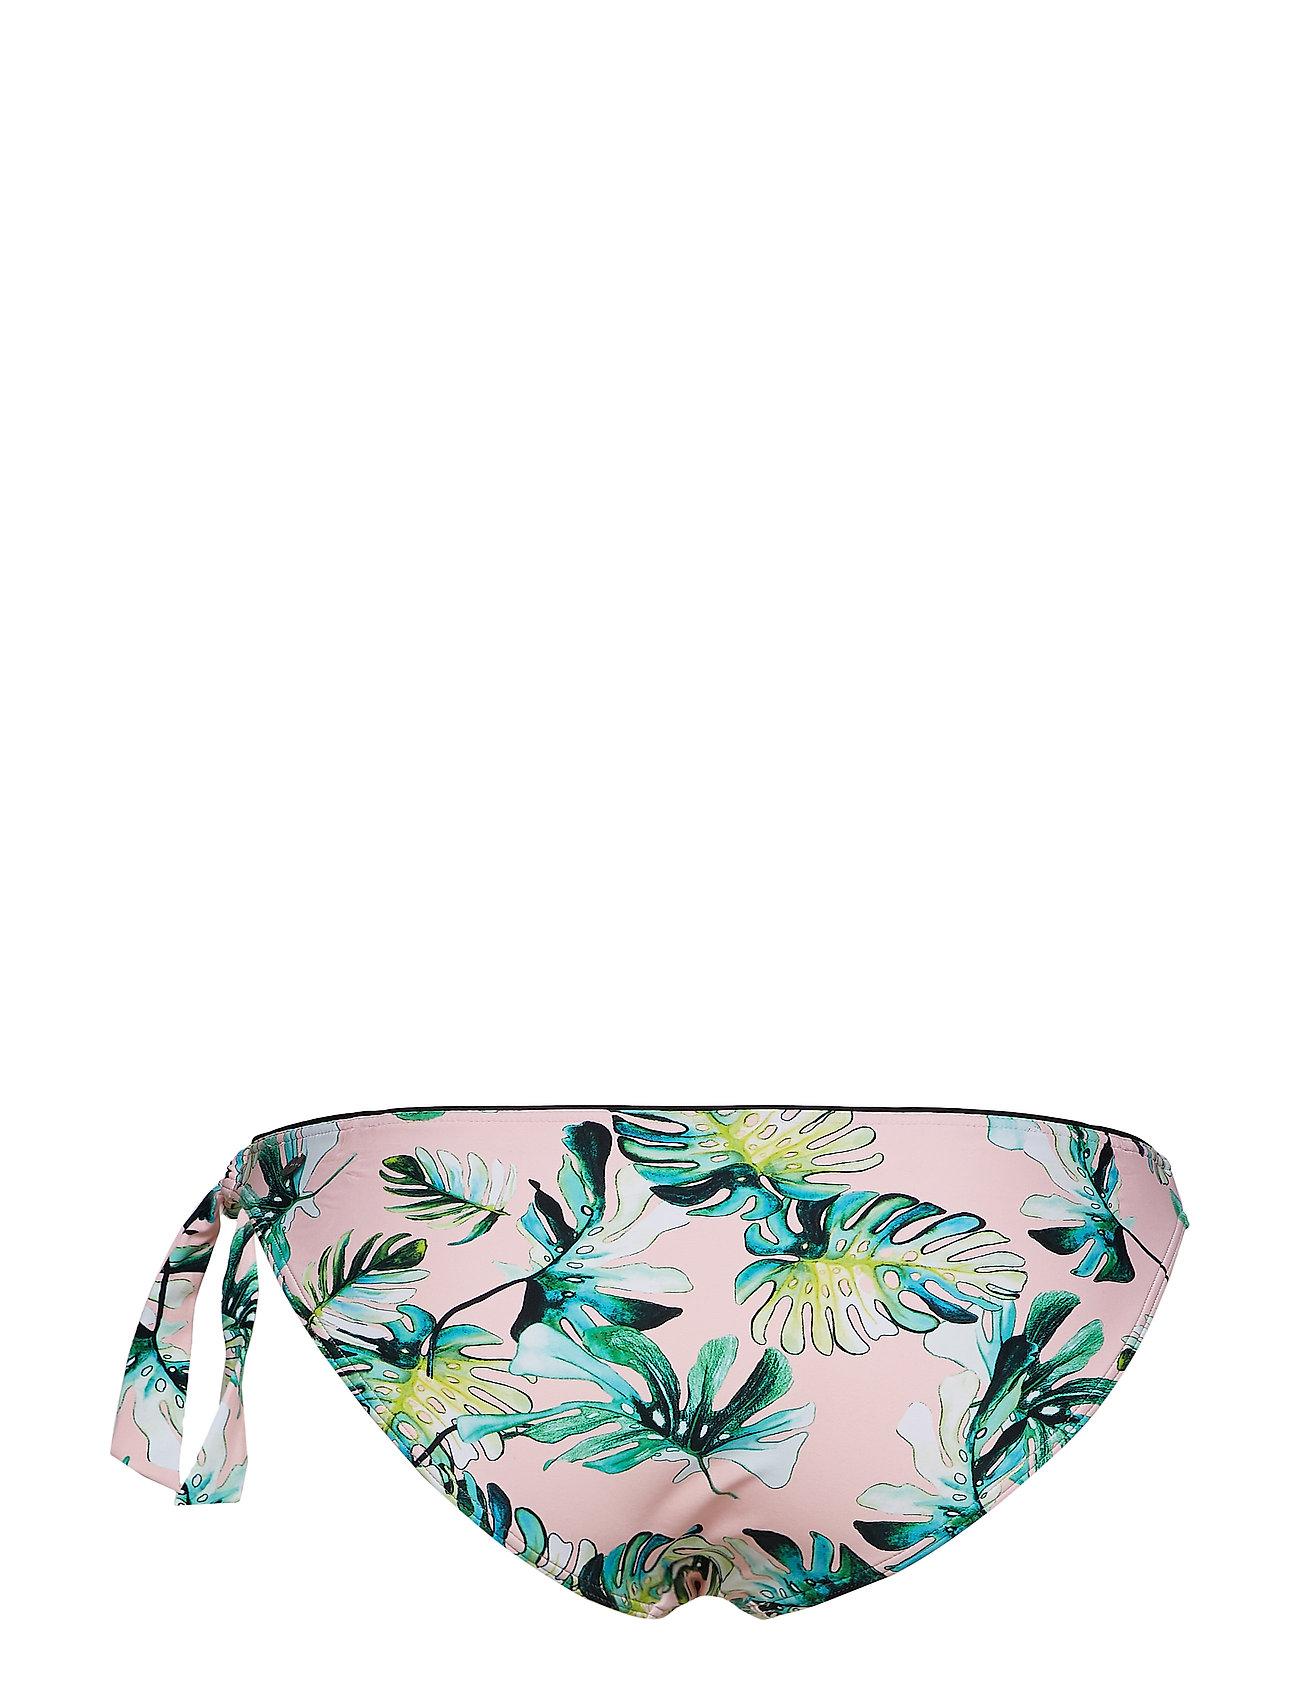 Esprit Bodywear Women Beach Bottoms - Swimwear LIGHT PINK